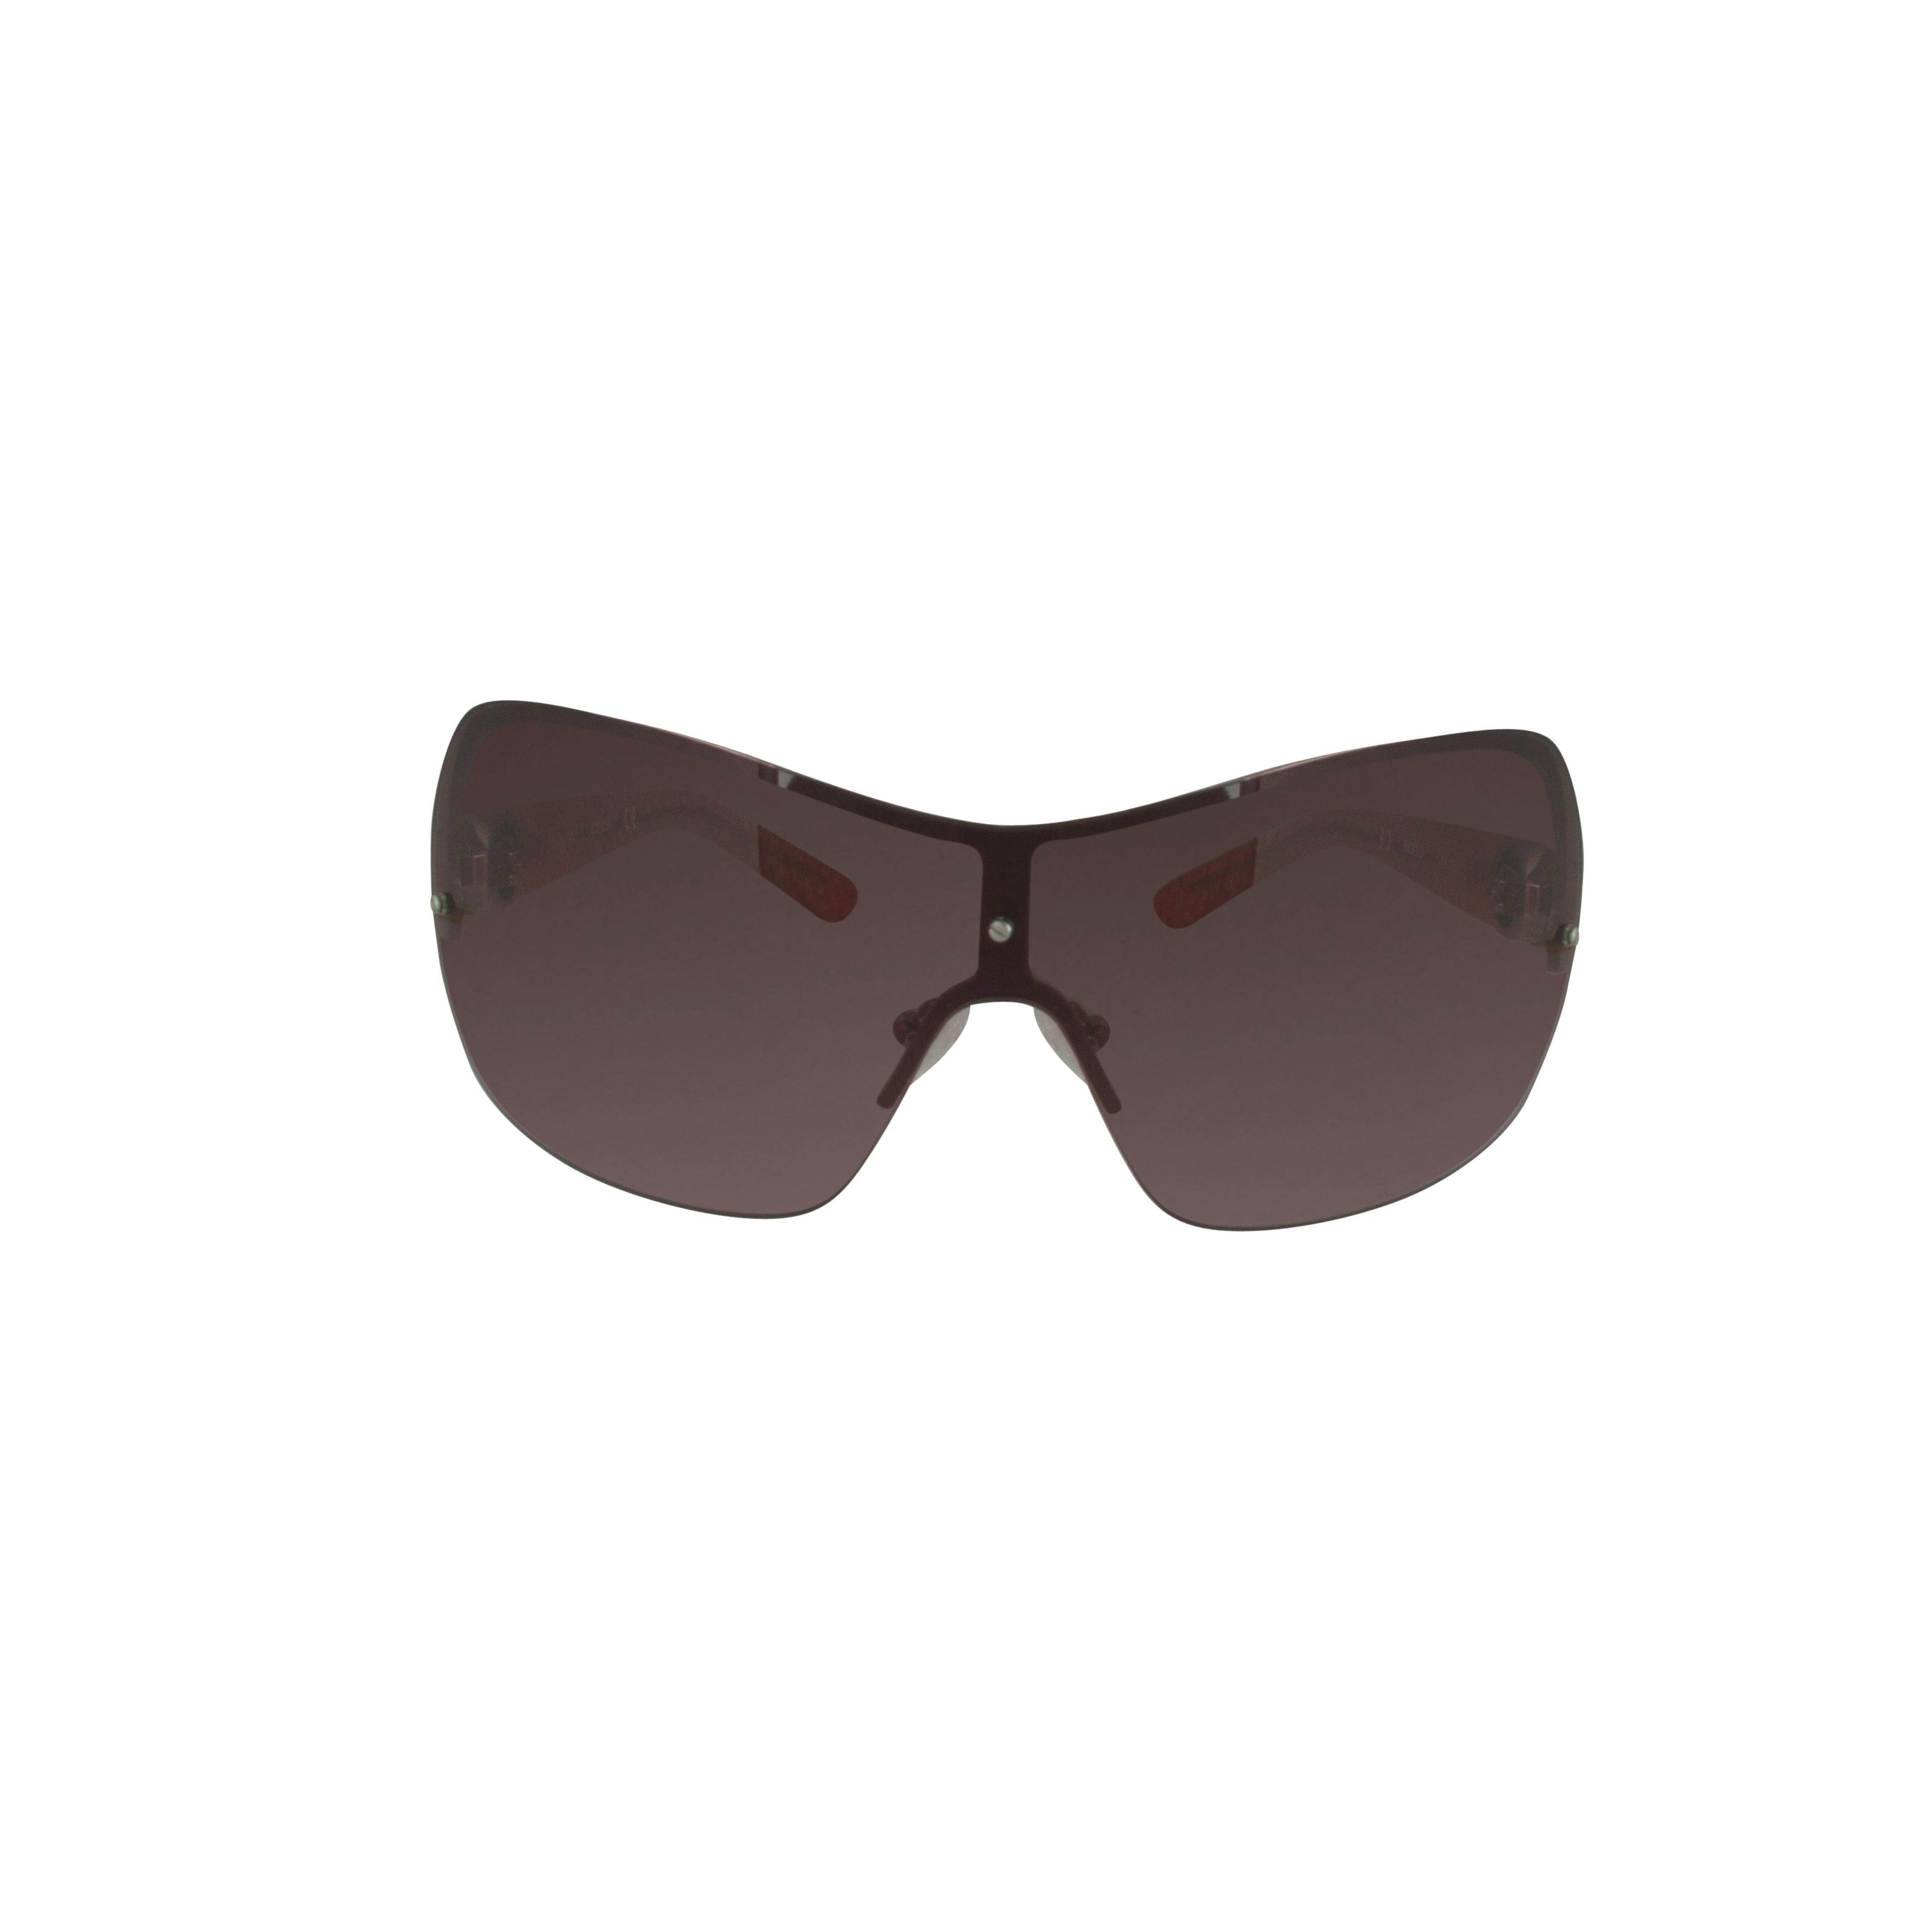 ac3a91b86b7 Guess Sunglasses Rimless Shield Frames - Restaurant and Palinka Bar